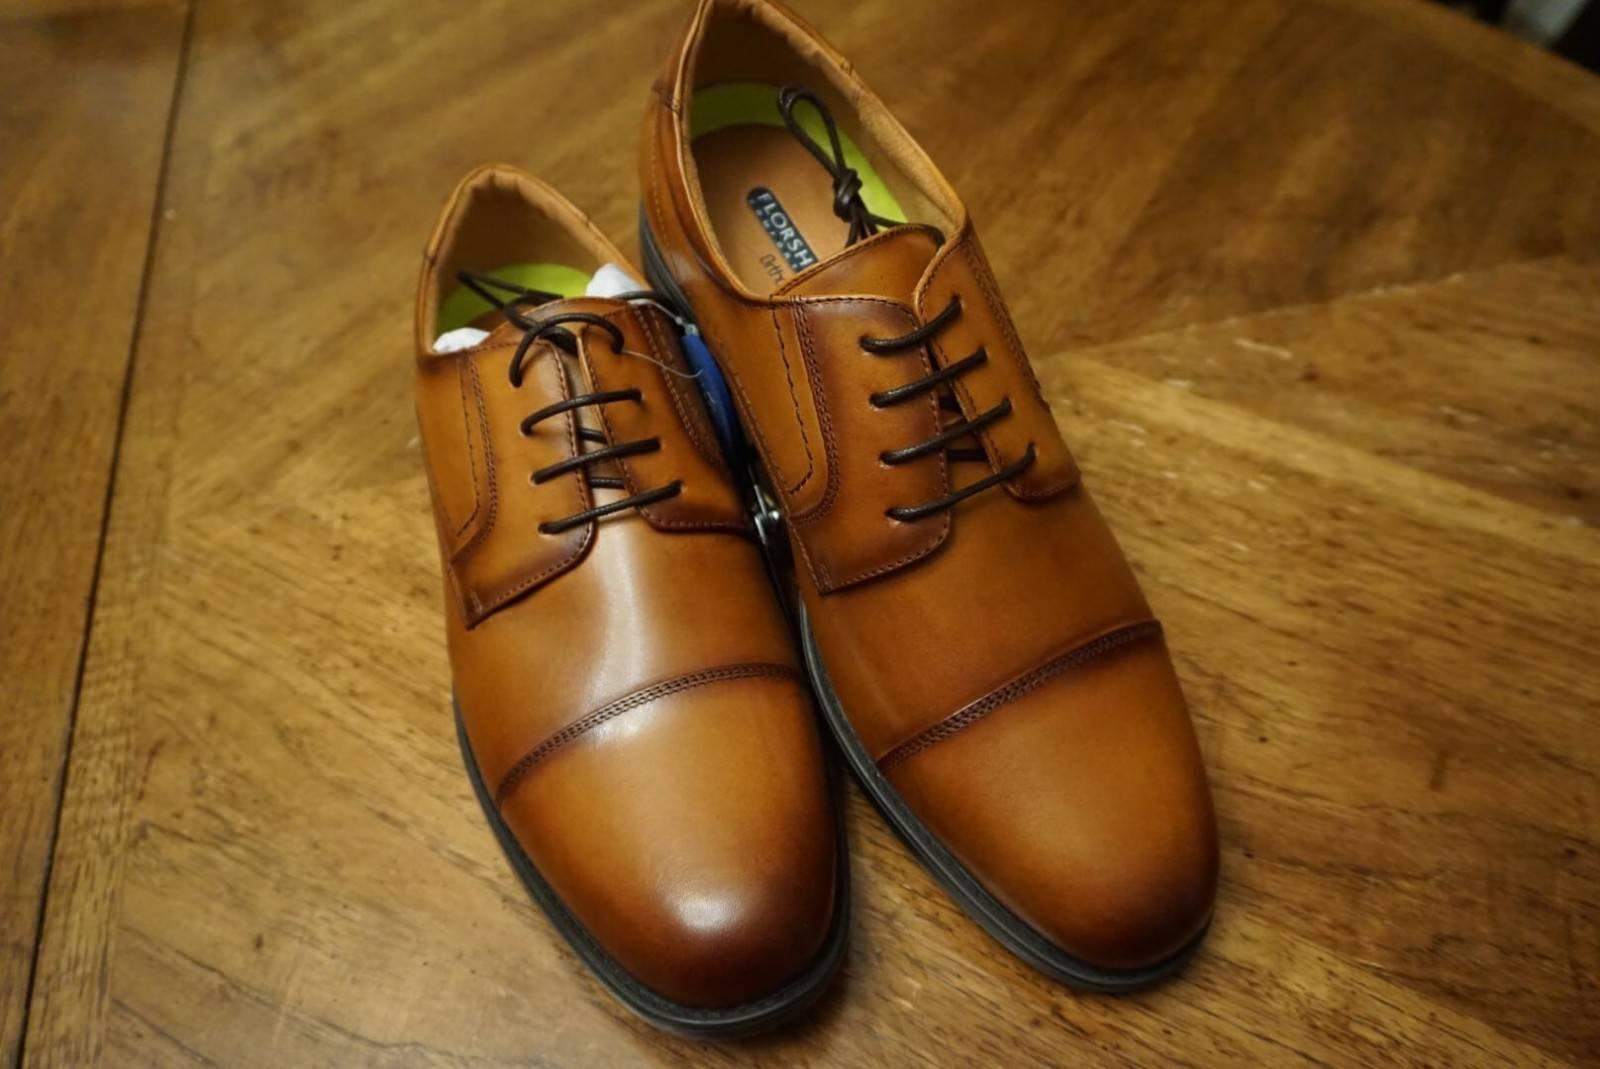 Florsheim schuhe Midtown Cap Toe Oxford Cognac Casual Casual Casual Dressy Leather 12138-221 5c8598